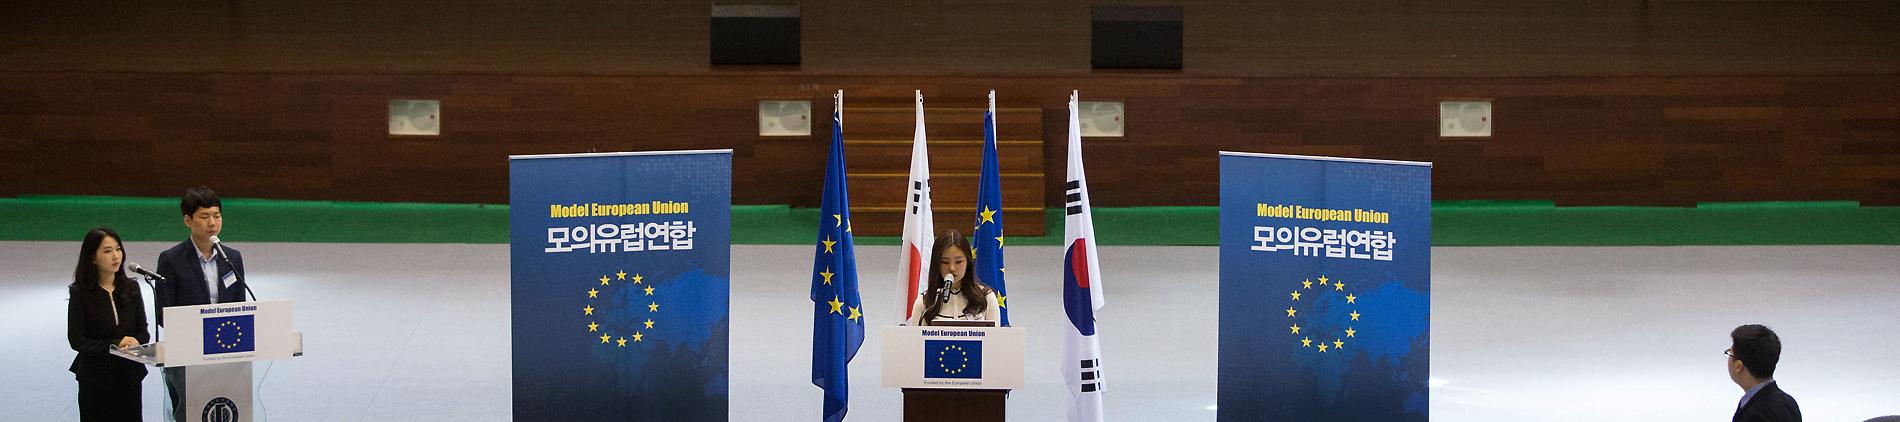 the Model European Union 2019